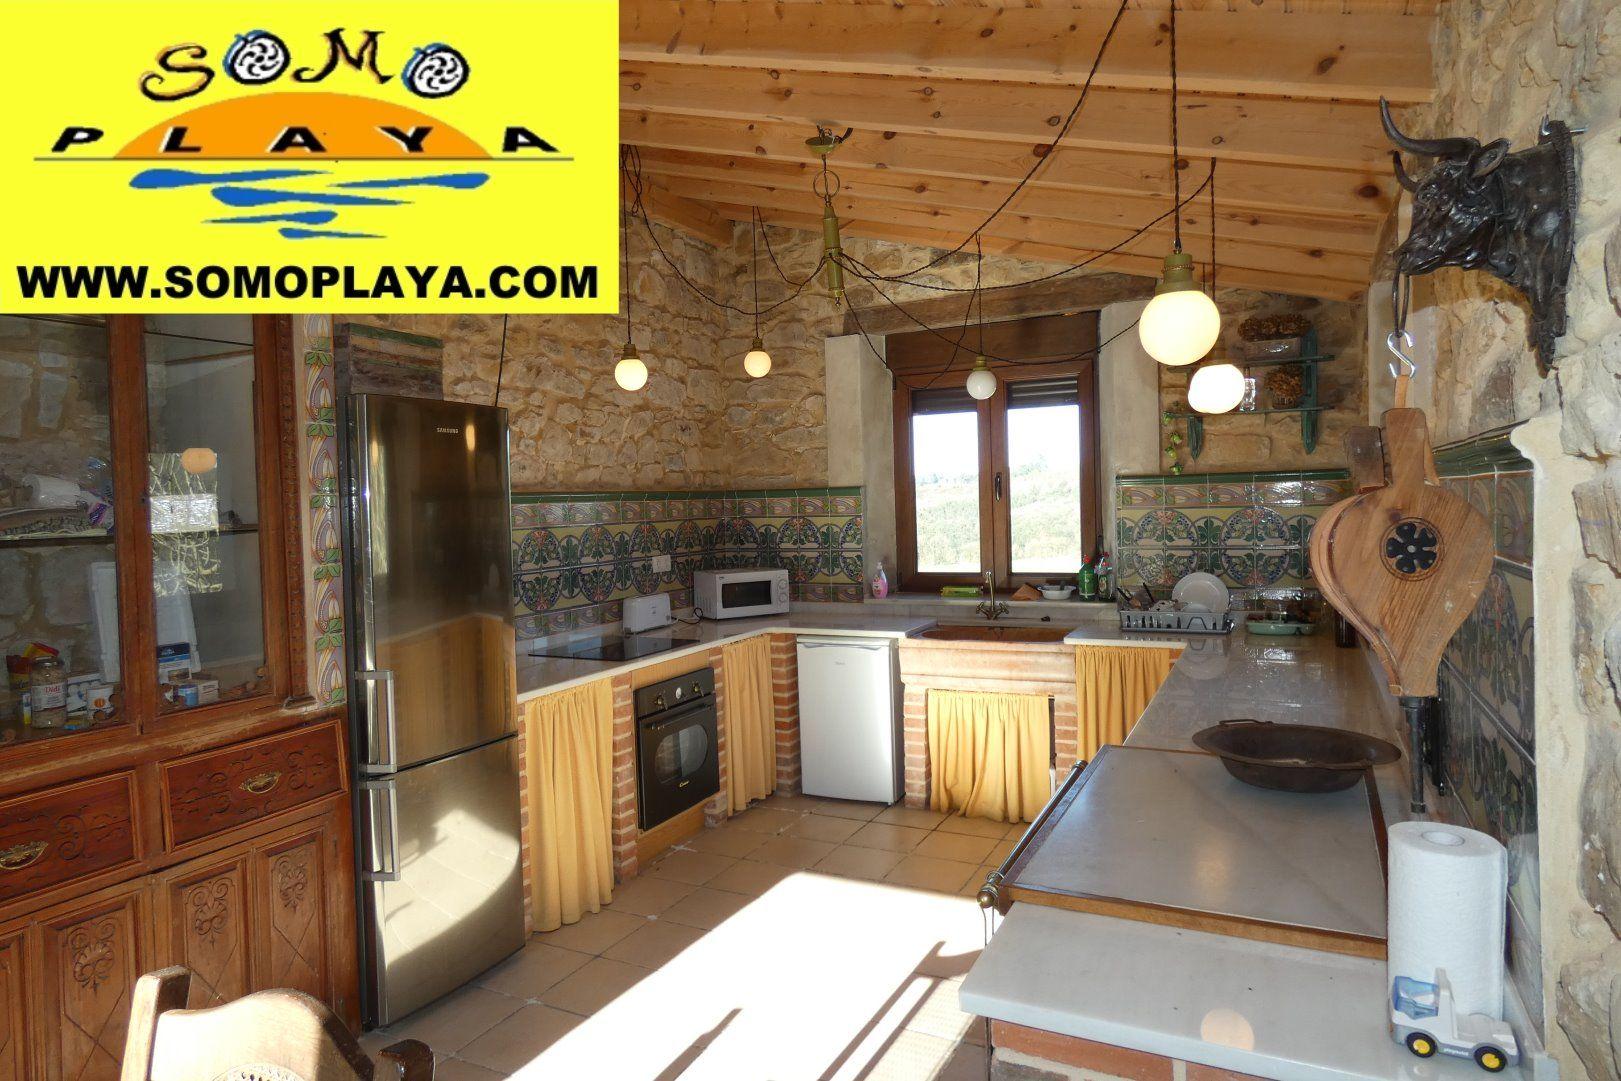 Villa en venta en Ribamontán al Monte zona Liermo